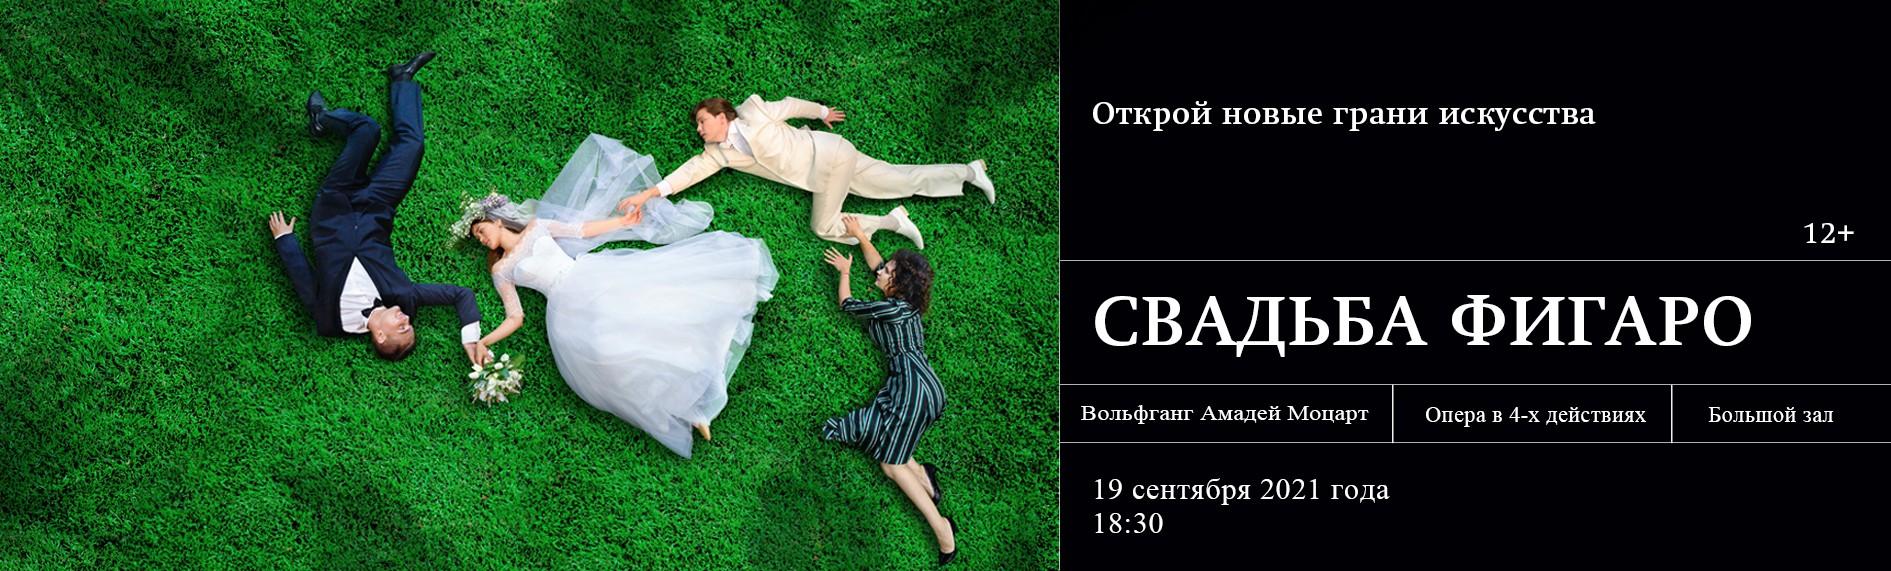 "Опера ""Свадьба Фигаро"""